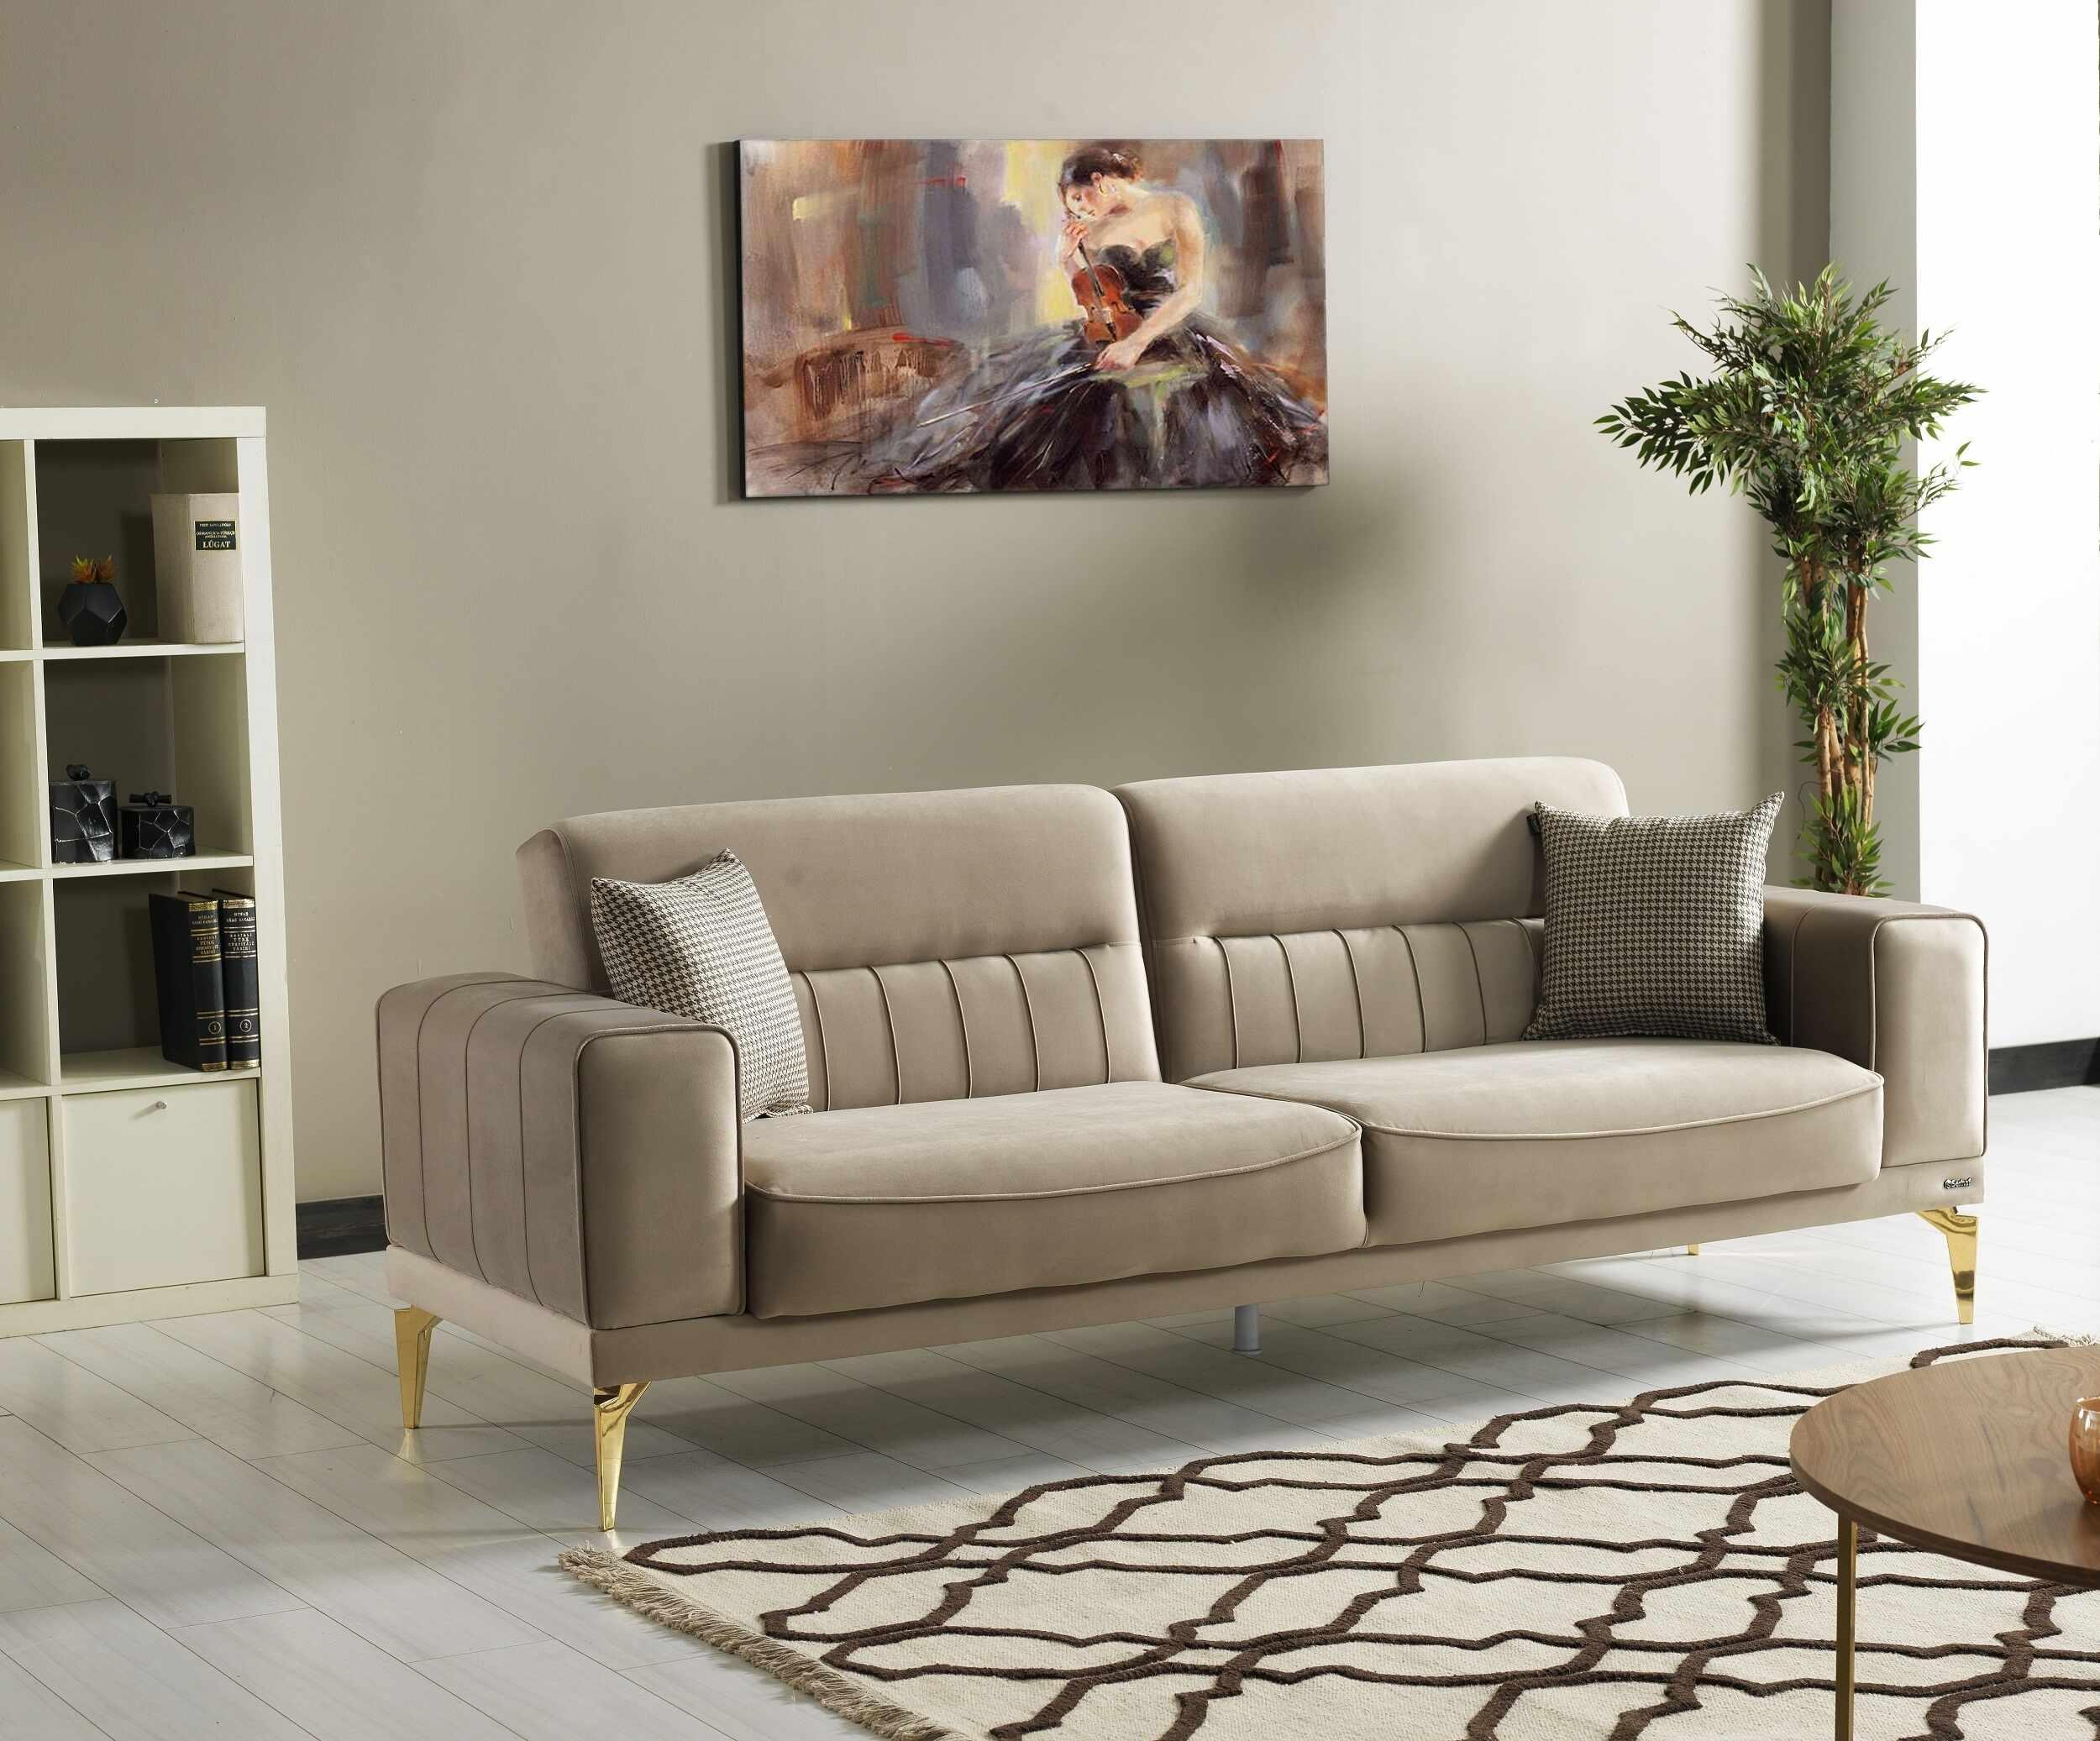 Canapea extensibila tapitata cu stofa, 3 locuri Nancy Velvet Bej / Auriu, l237xA88xH87 cm la pret 2792 lei